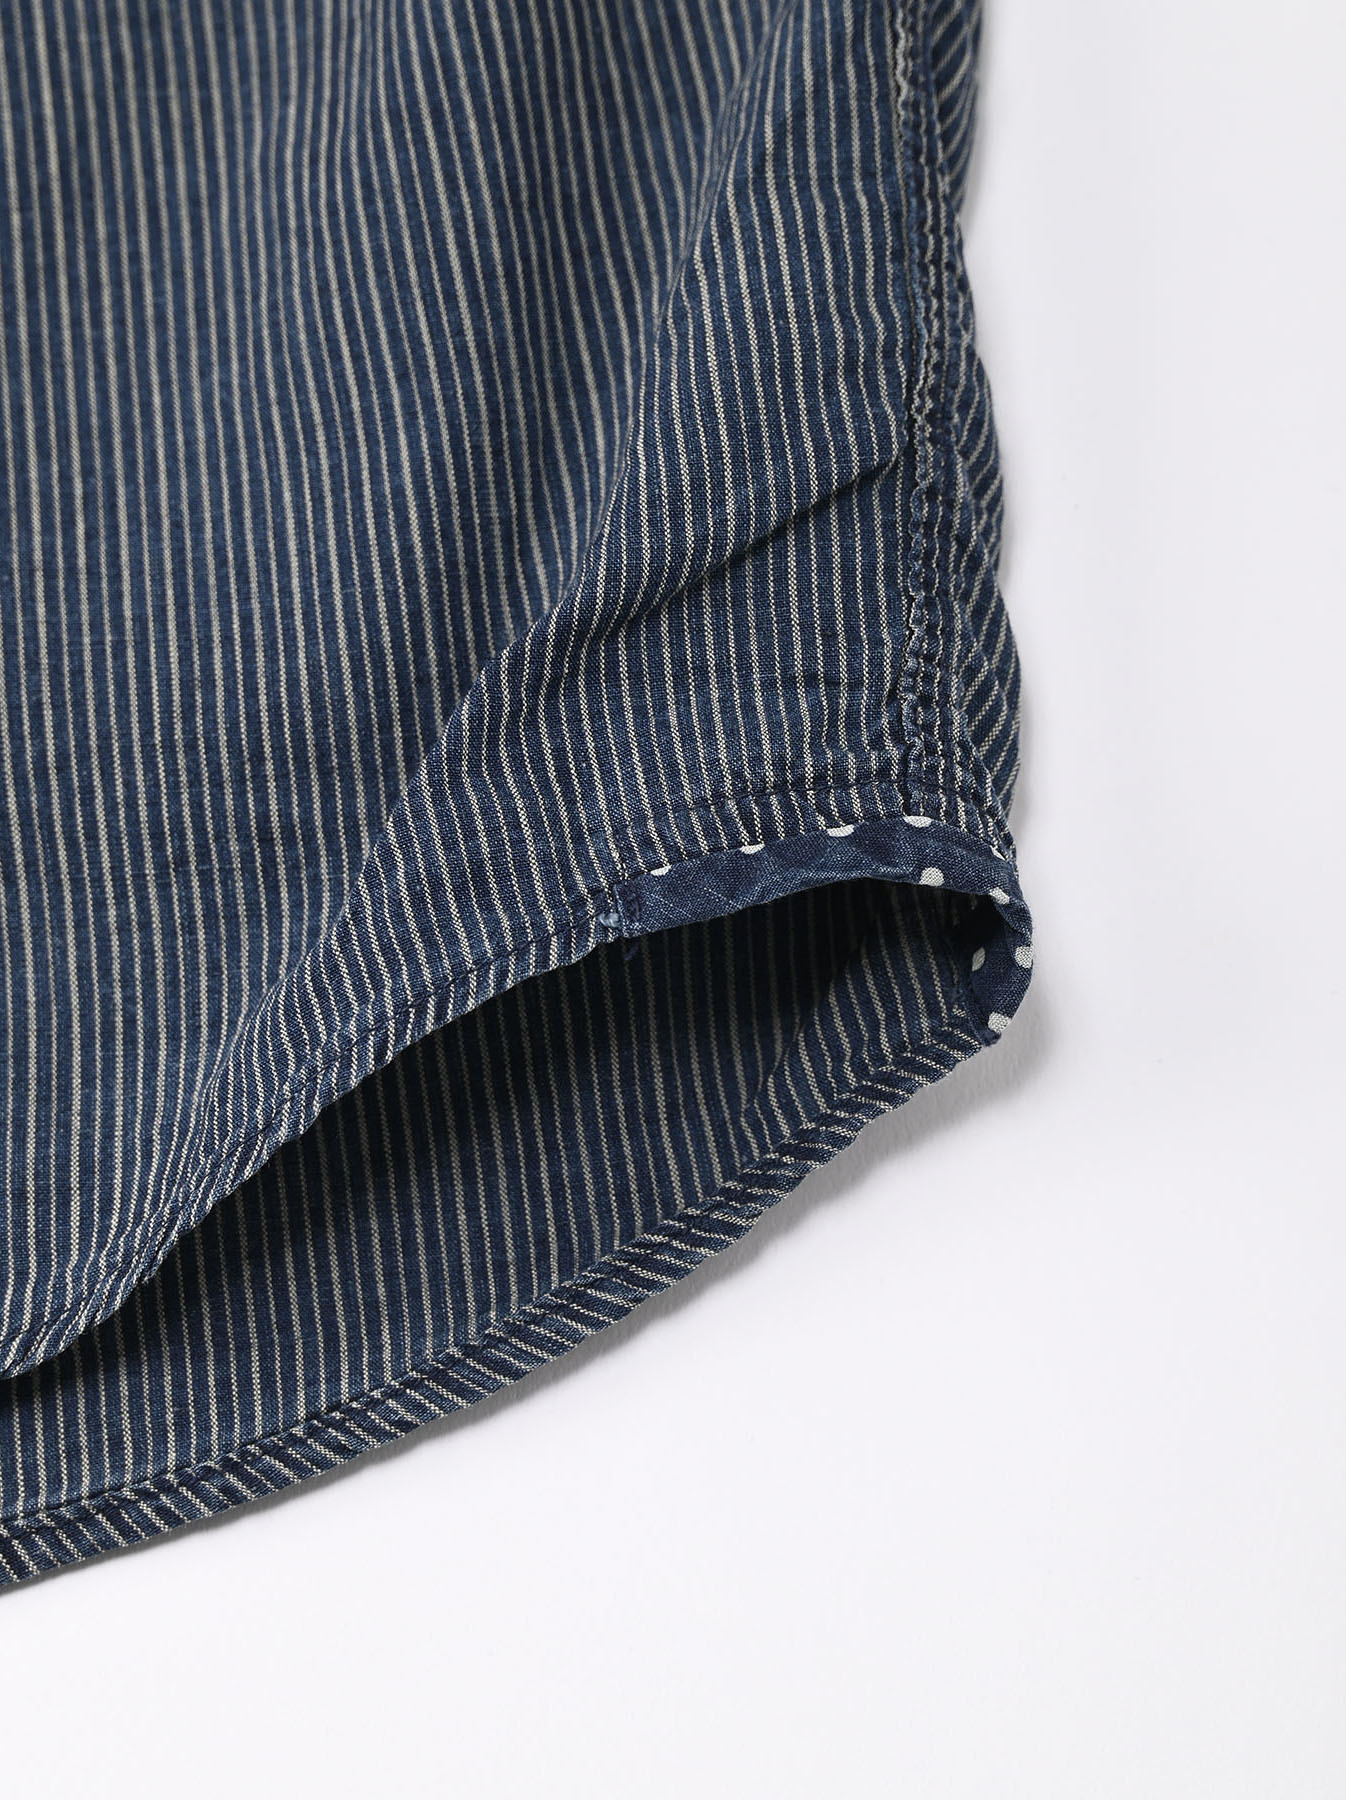 Indigo Hickory Tappet Ocean Stand Shirt-9